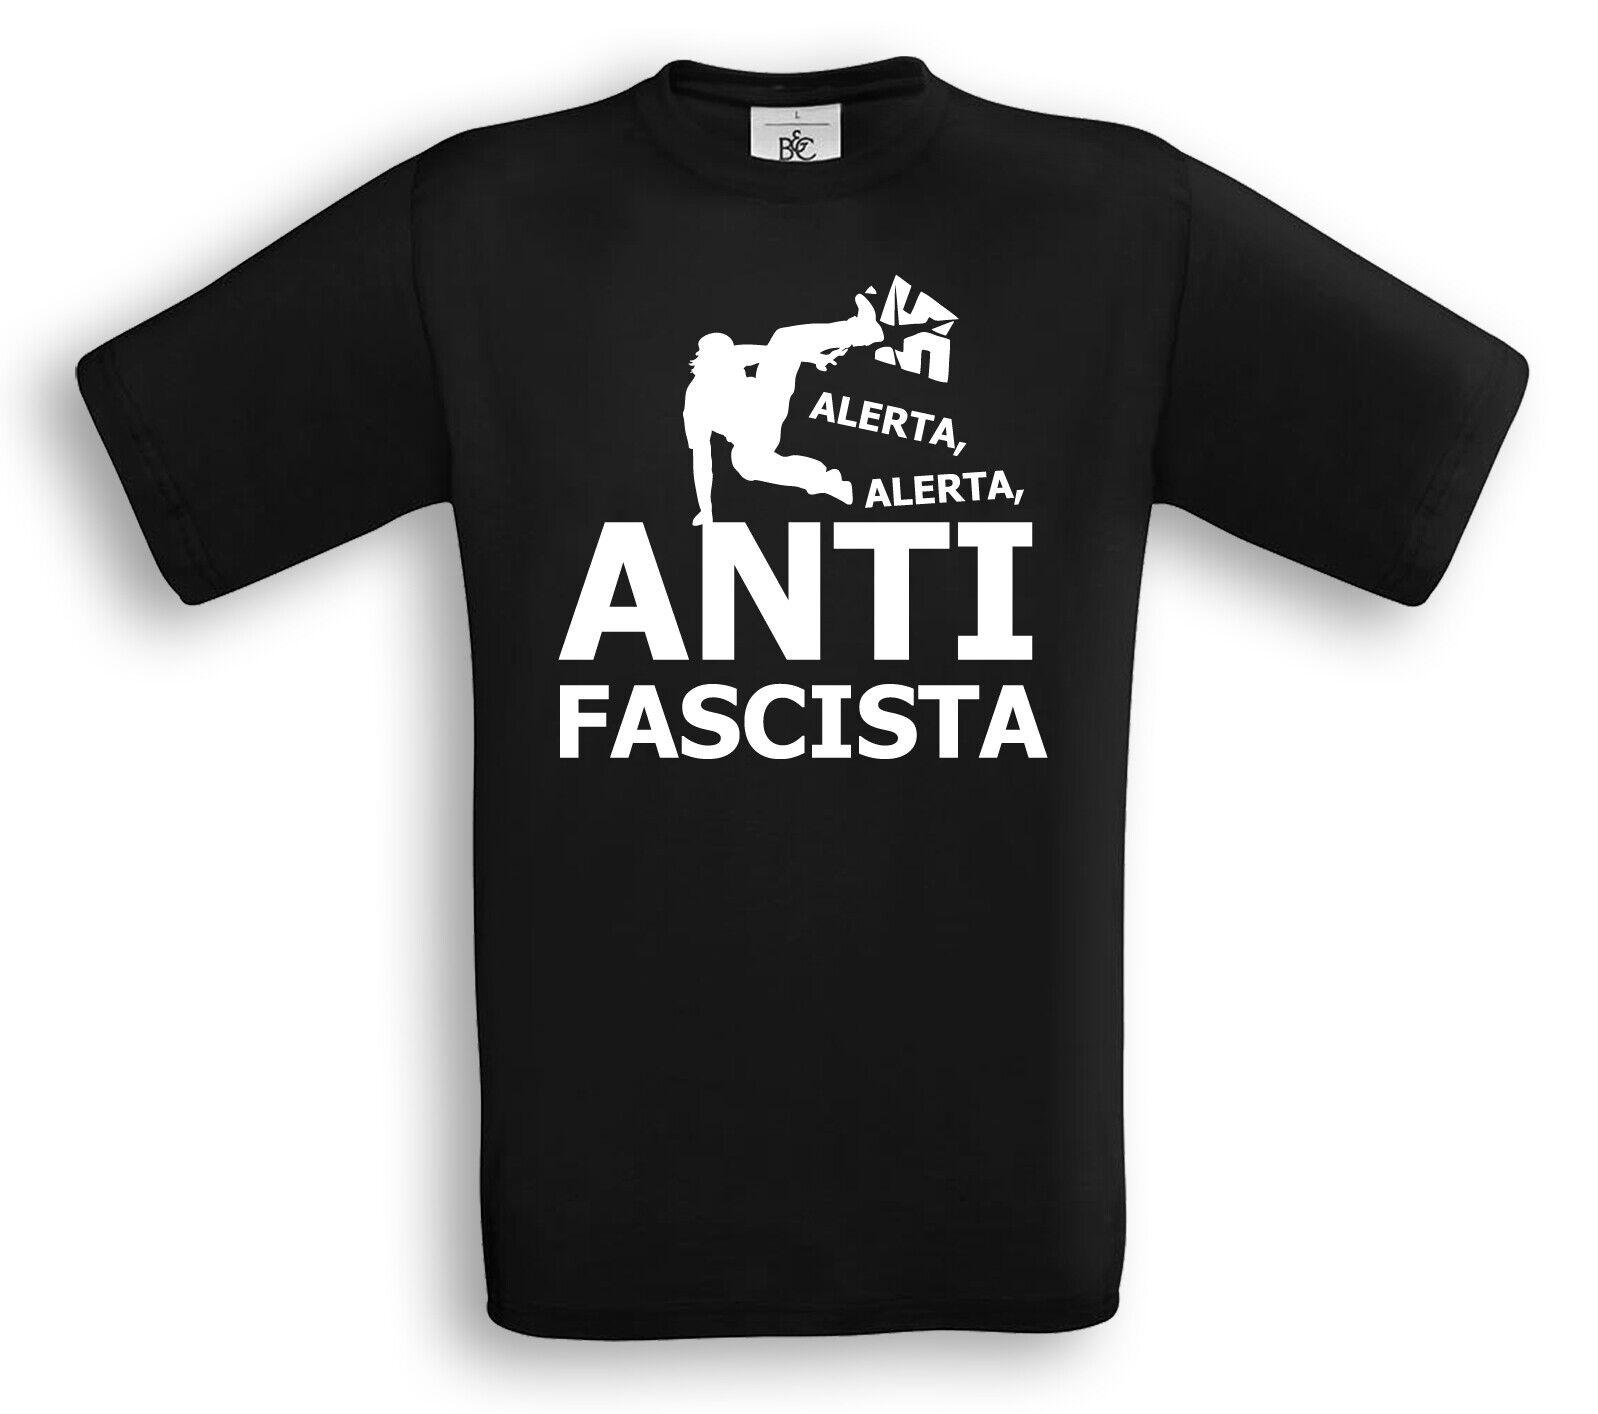 Alerta Alerta ANTIFASCISTA T-Shirt FCK NZS Gegen Nazis Parkour Punk Hardcore